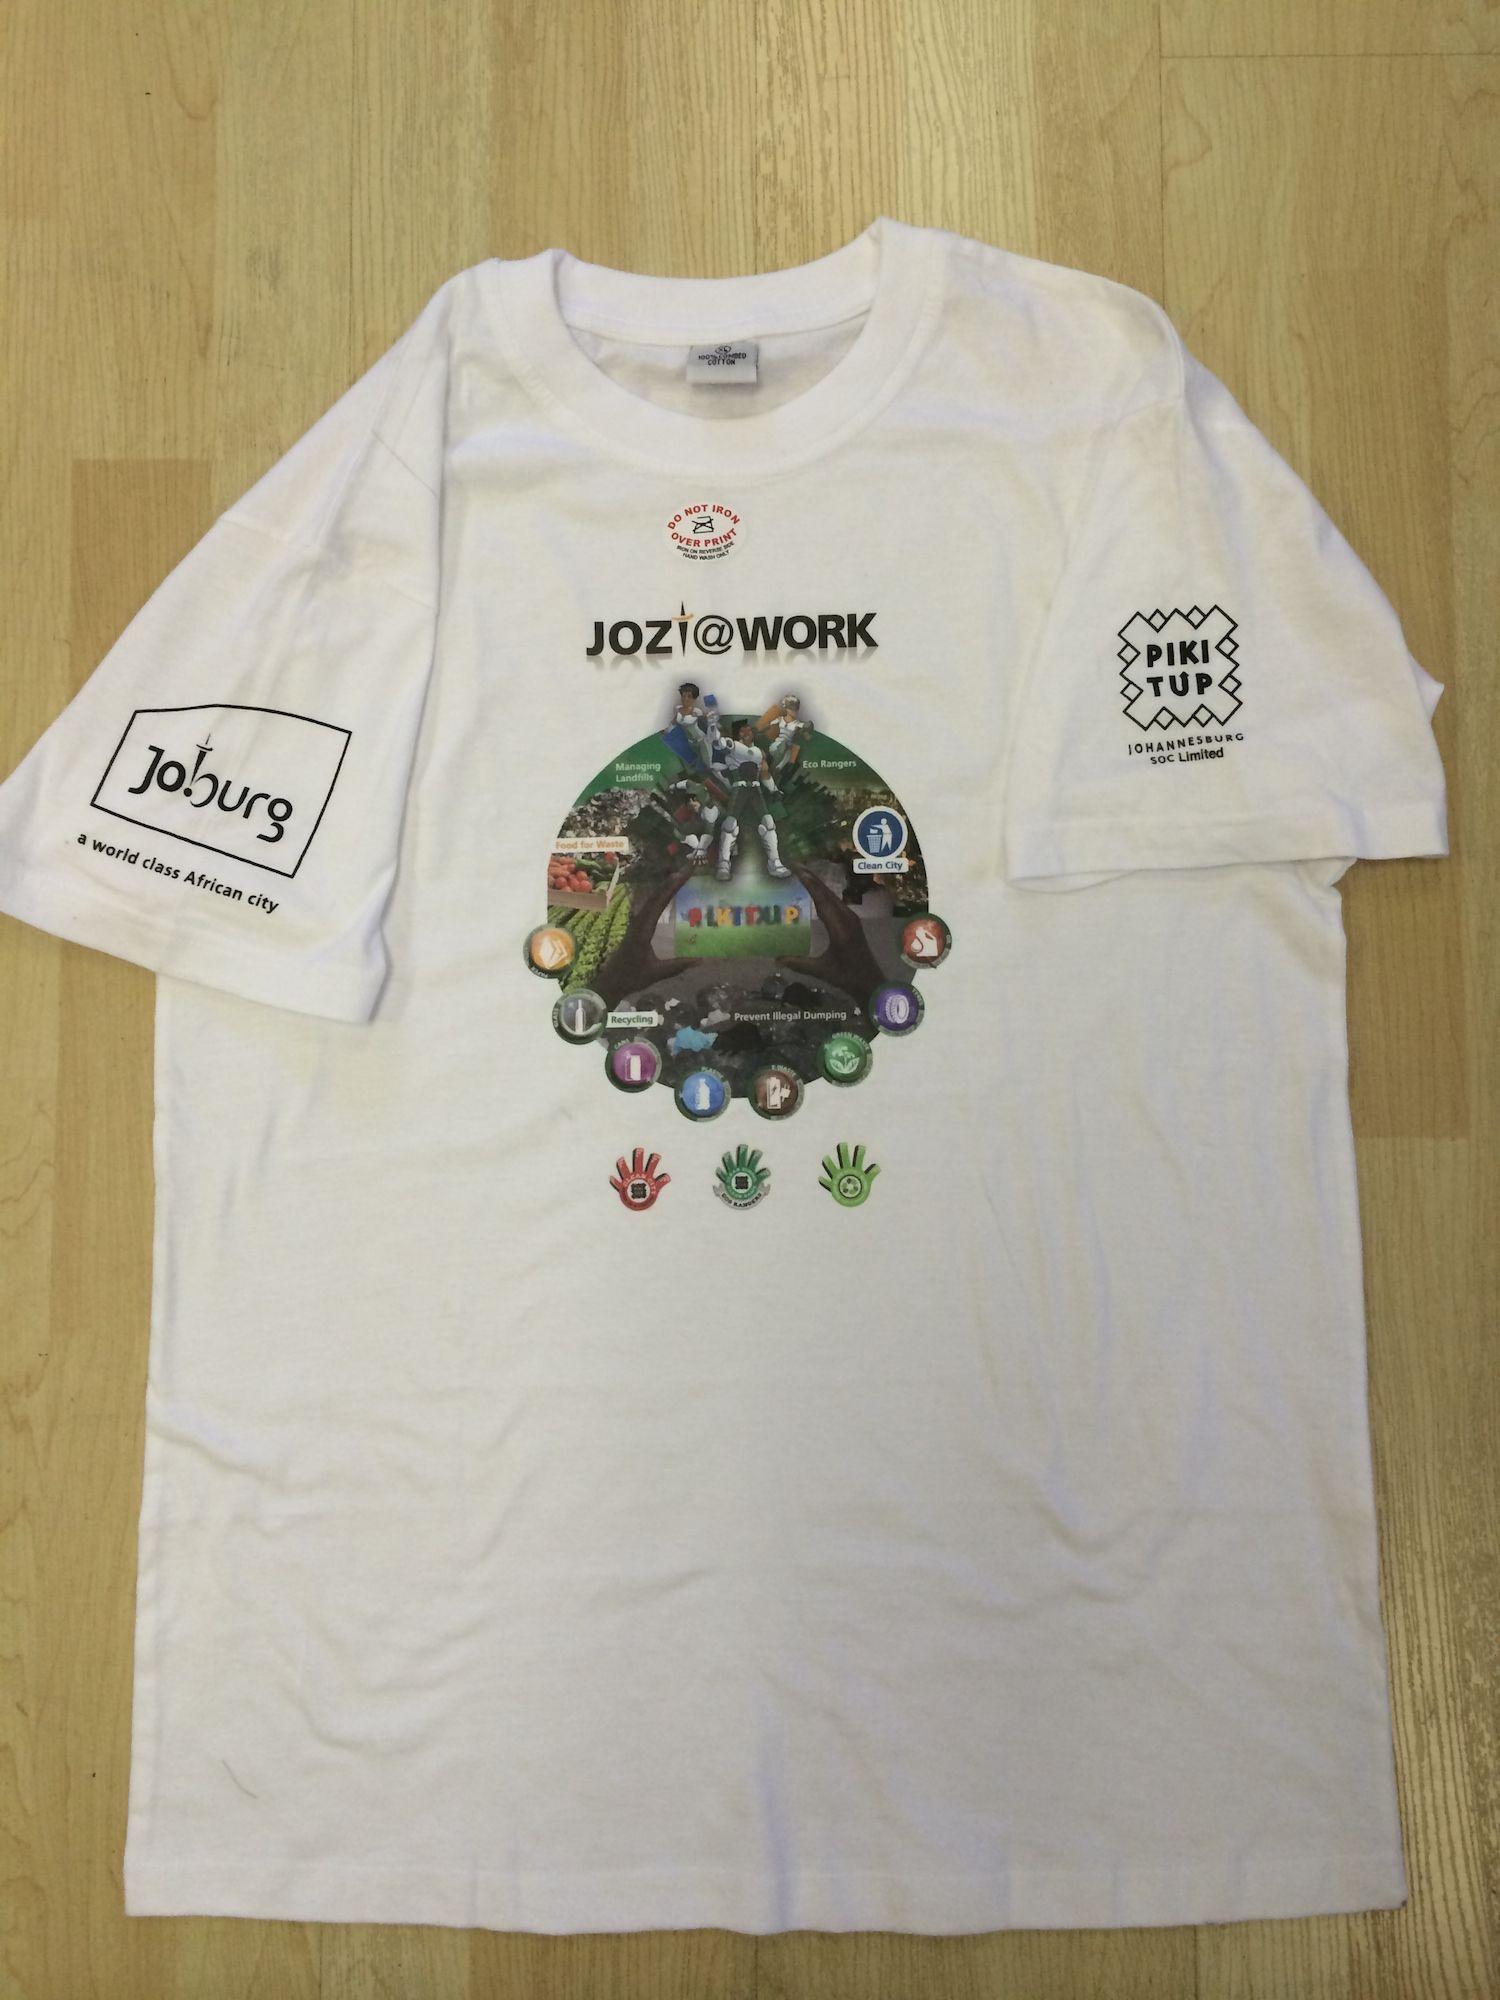 Printing T Shirt Companies In Johannesburg « Alzheimer's Network of